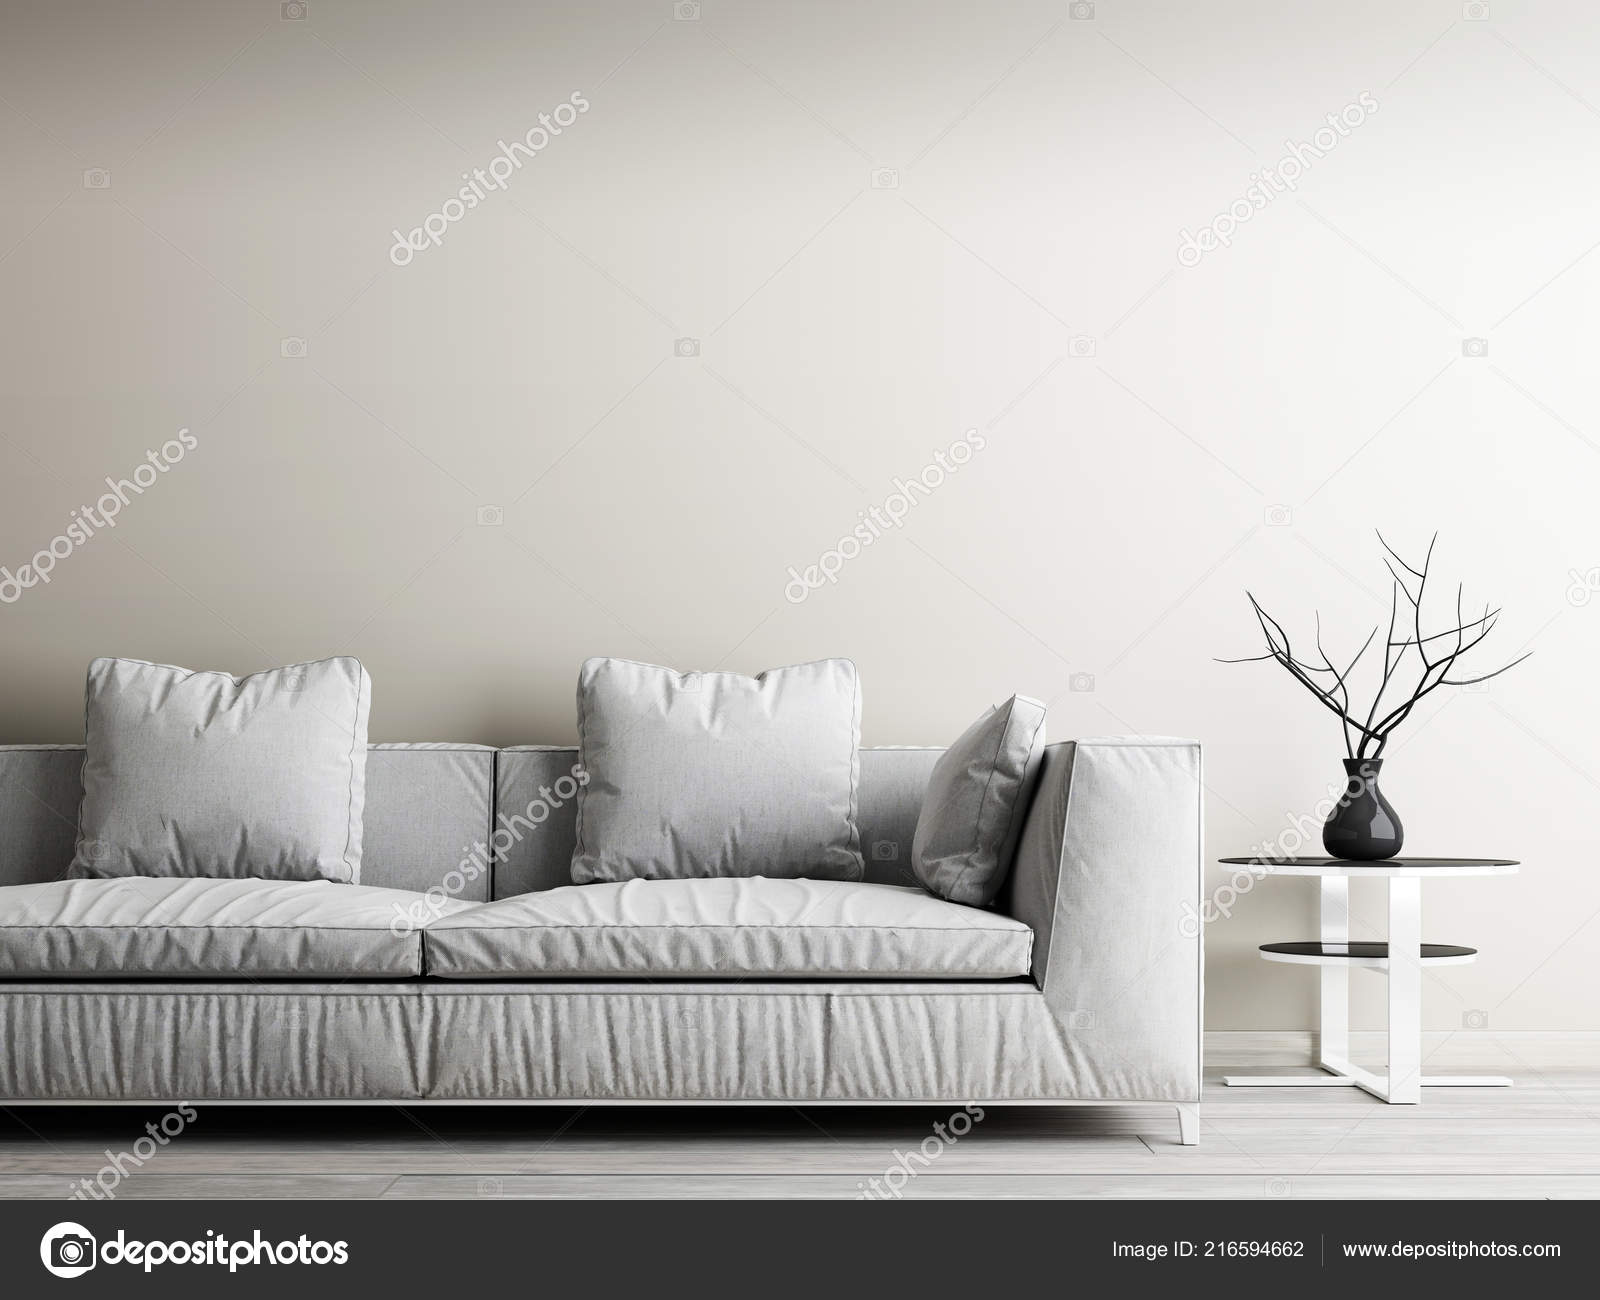 Moderne Interieur Van Woonkamer Home Decor Concept Witte Bank Tafel Stockfoto C Kuprin33 216594662